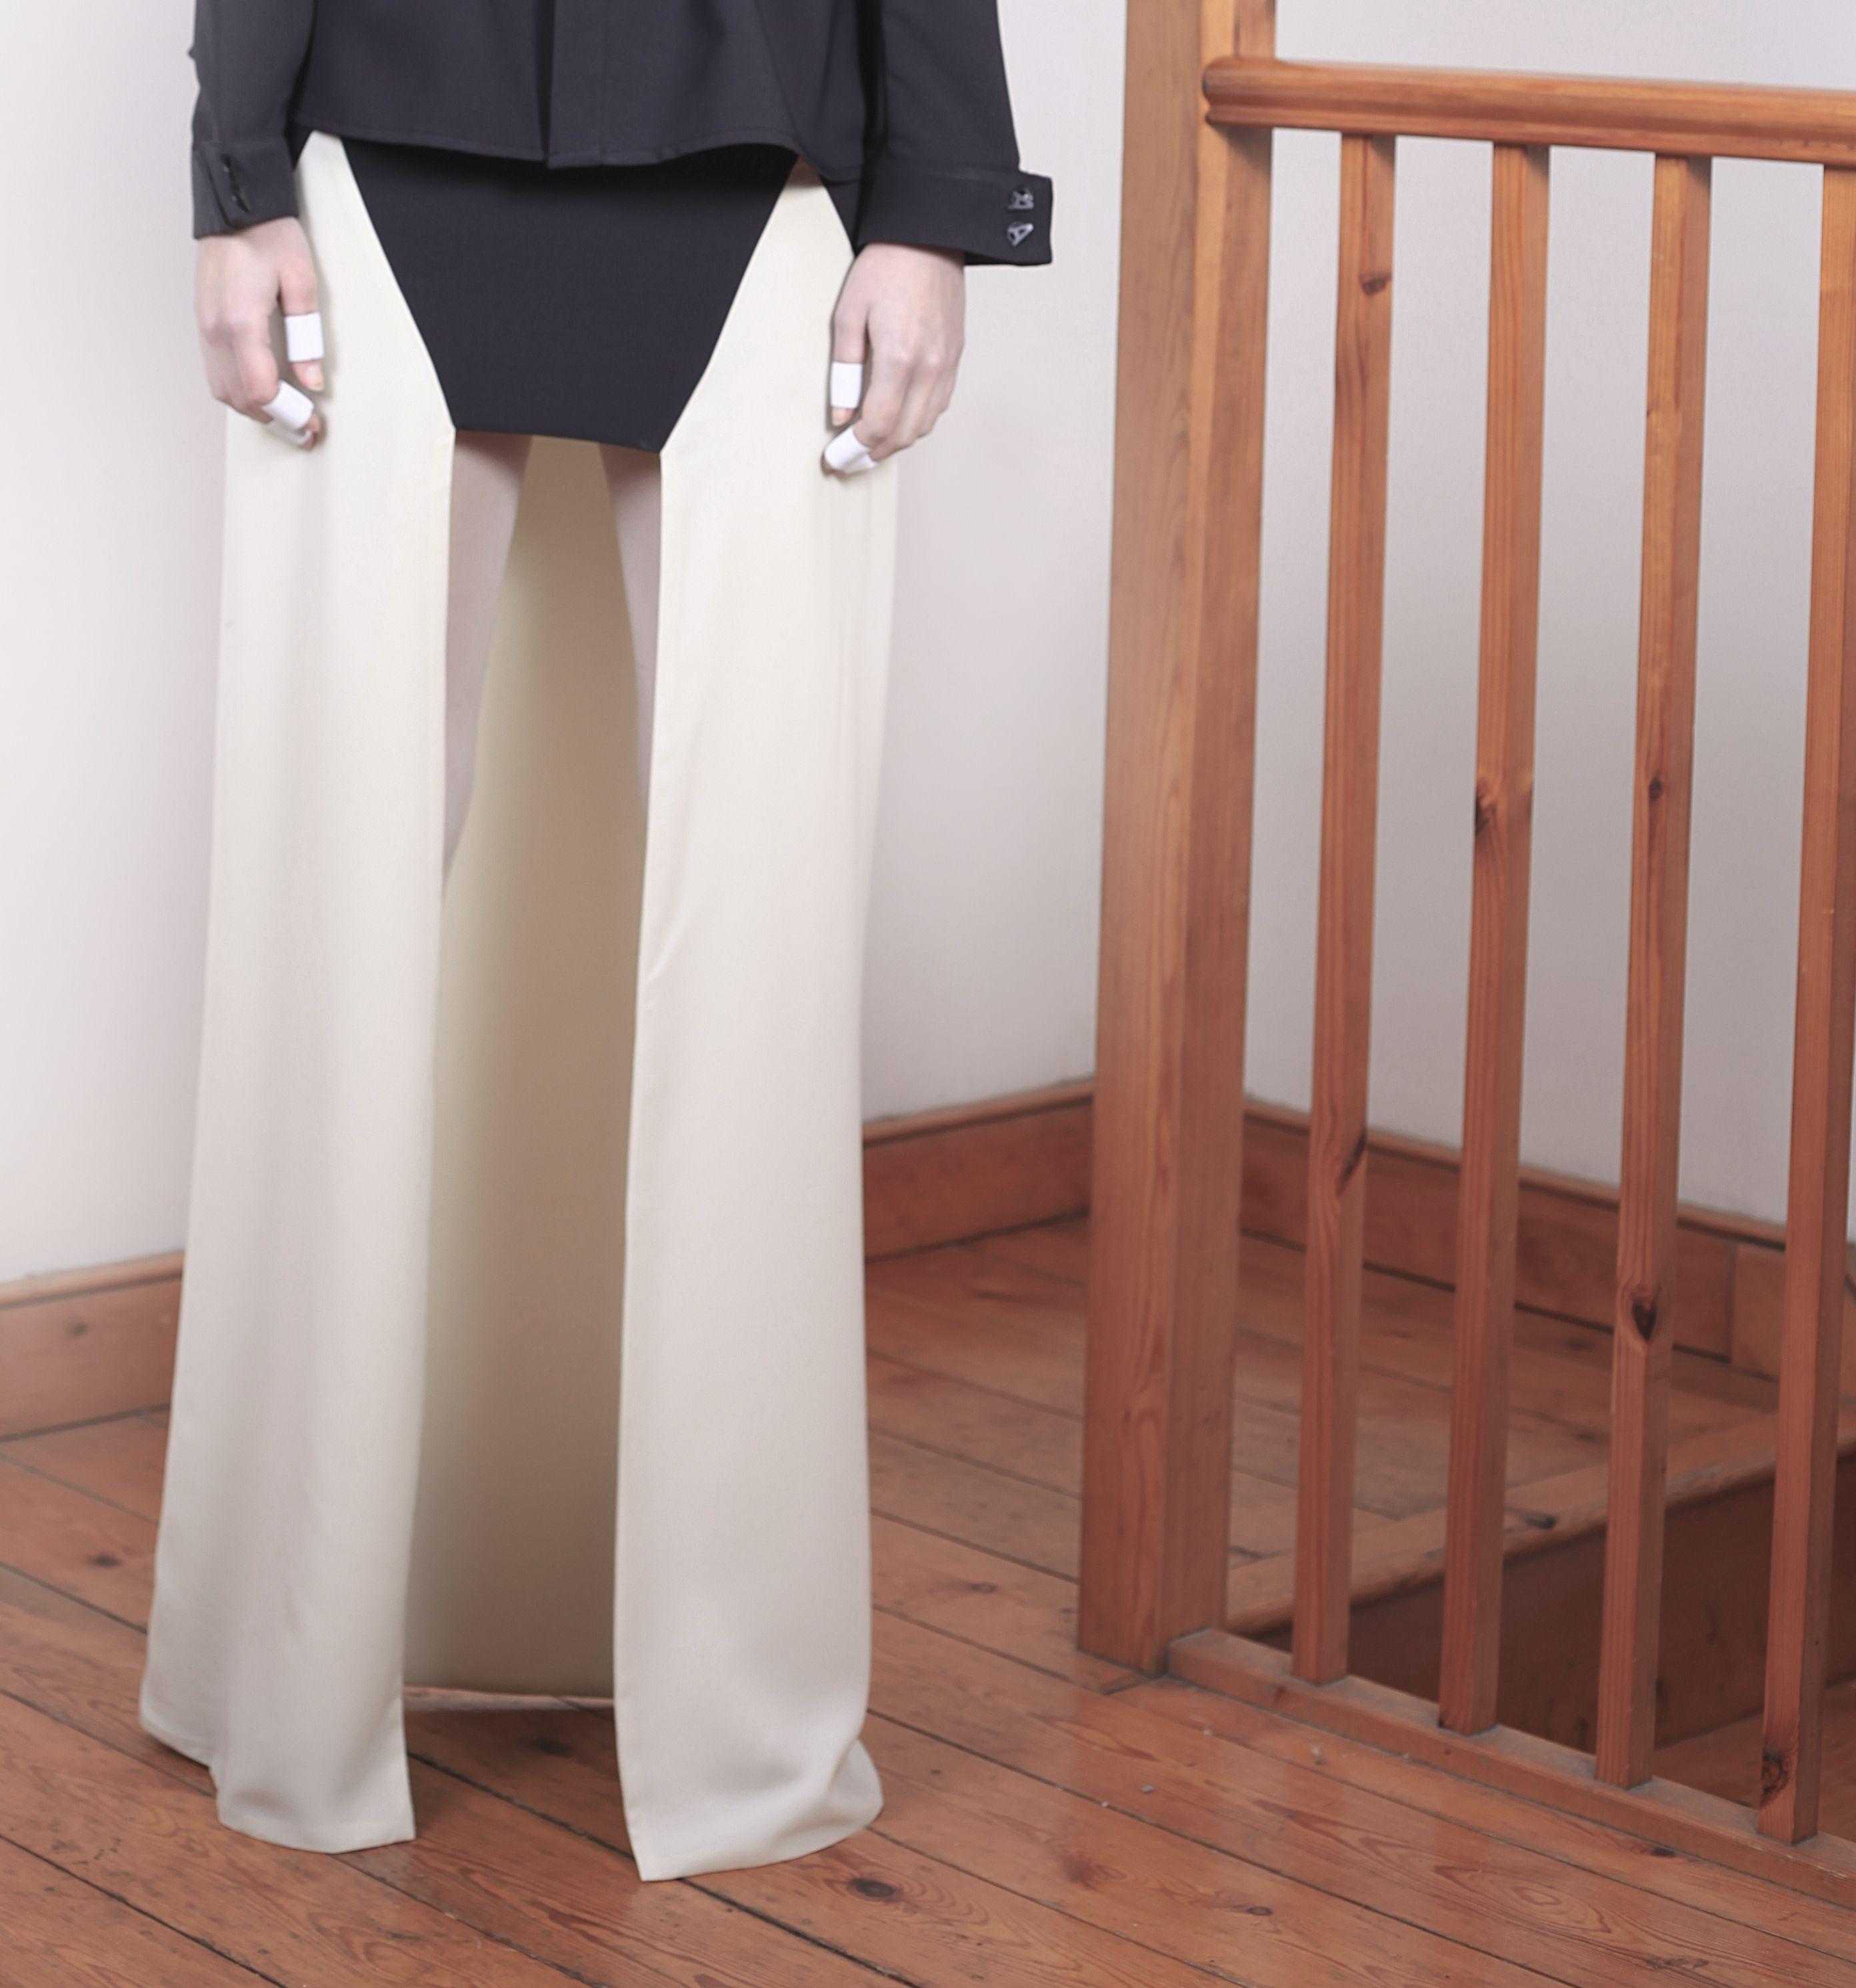 VVHATIF AVV13 'A for Aloysius'  VVOMAN 1 - graphic gap skirt  Like us on facebook